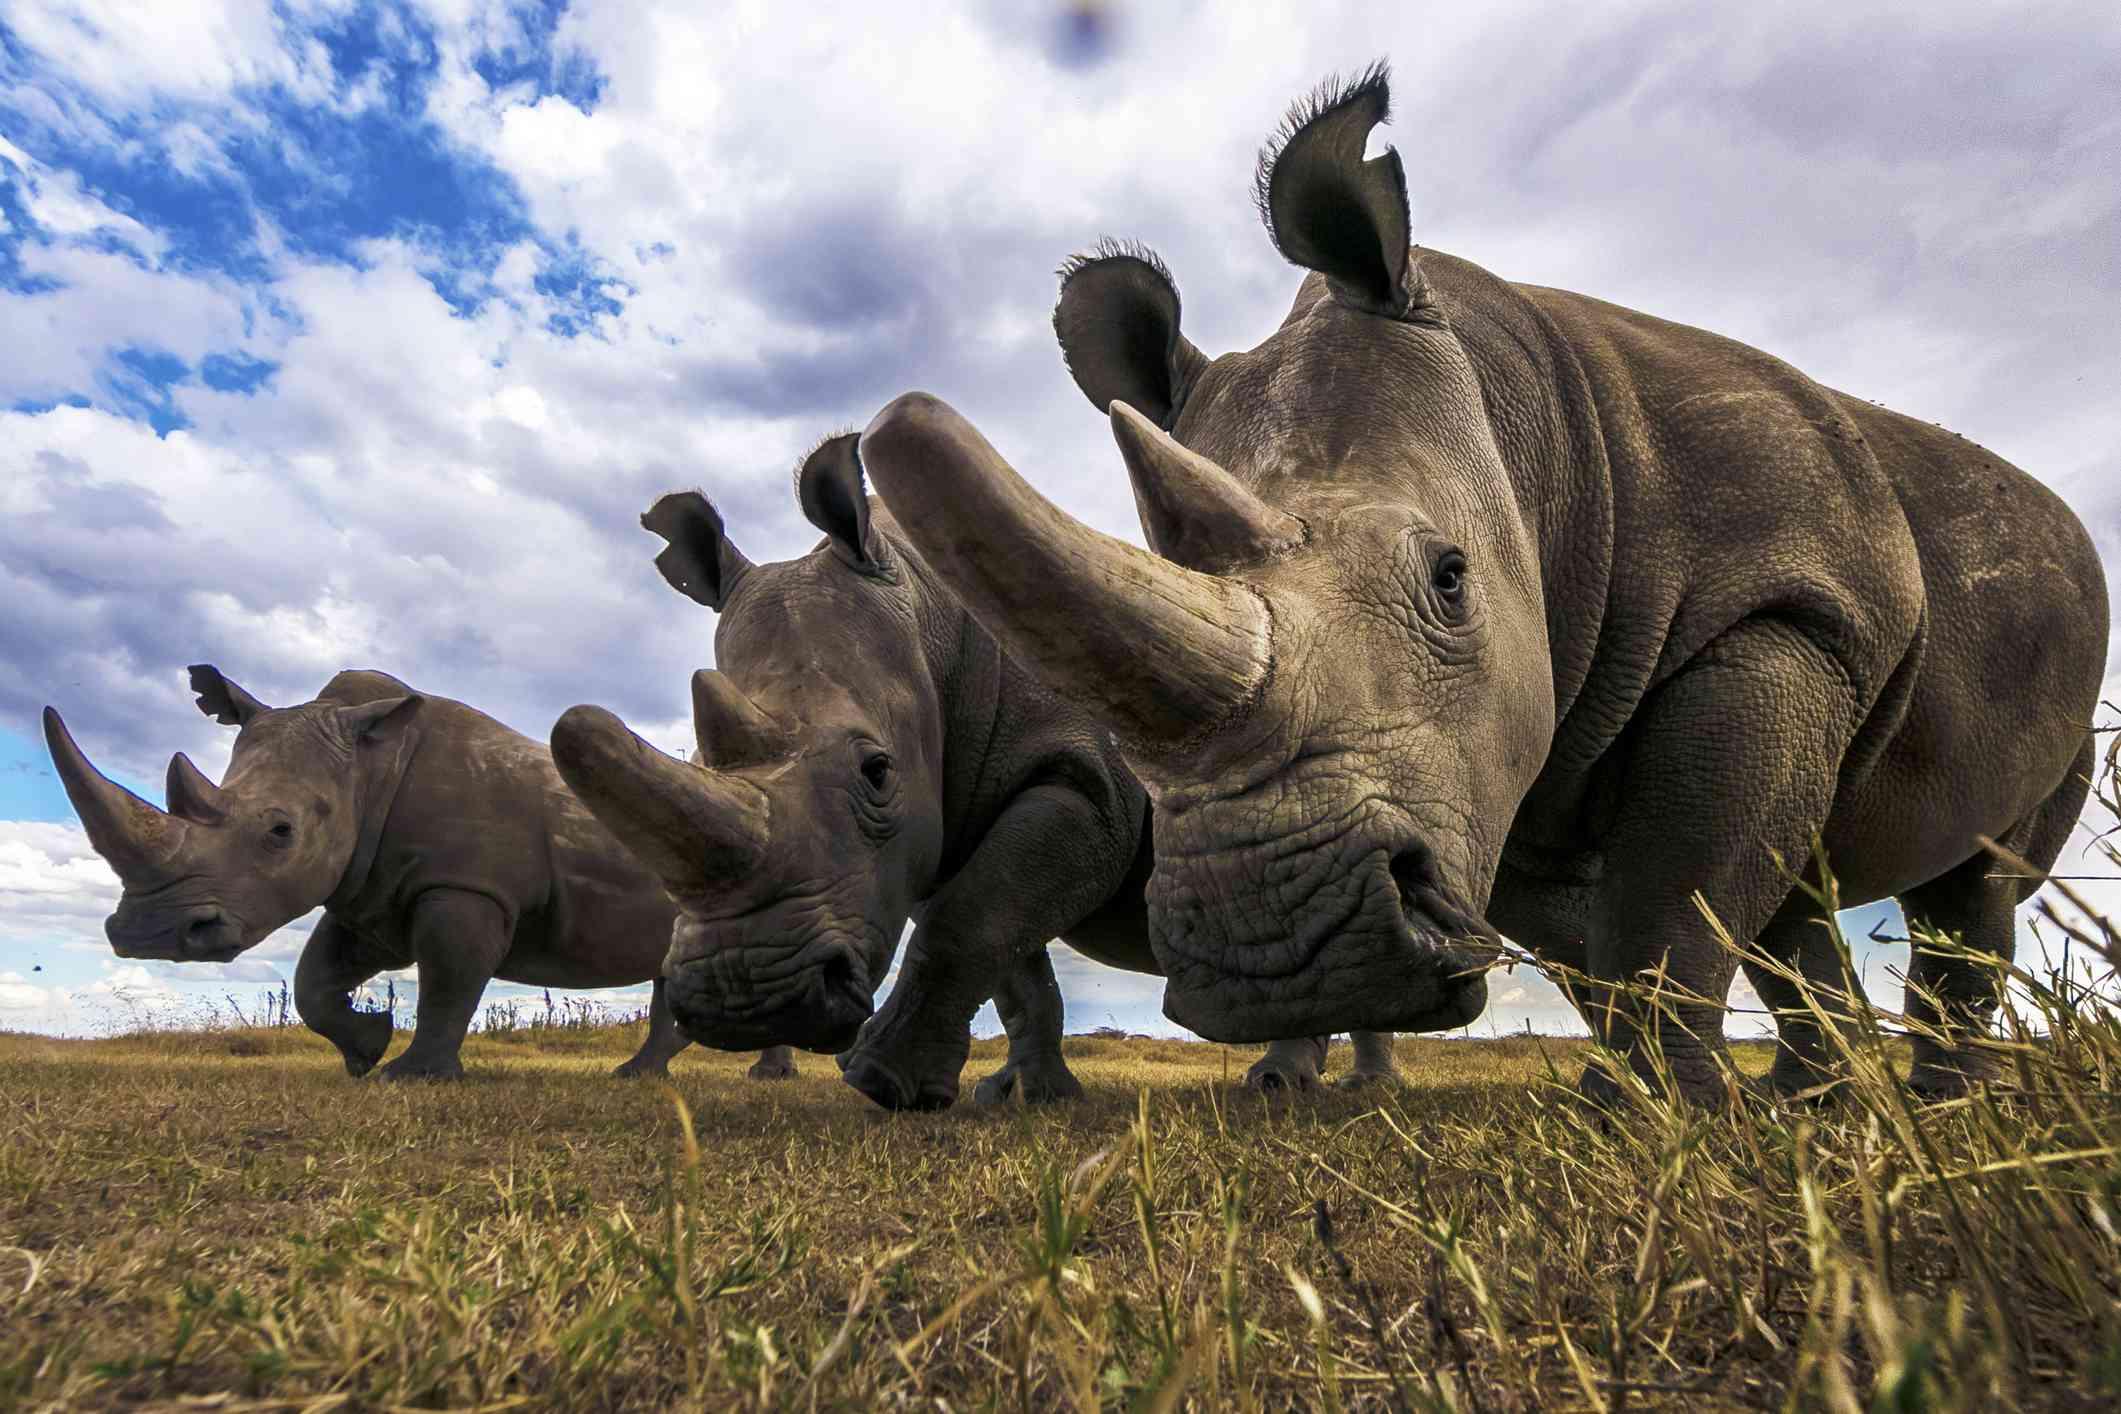 A southern white rhino alongside two northern white rhino females